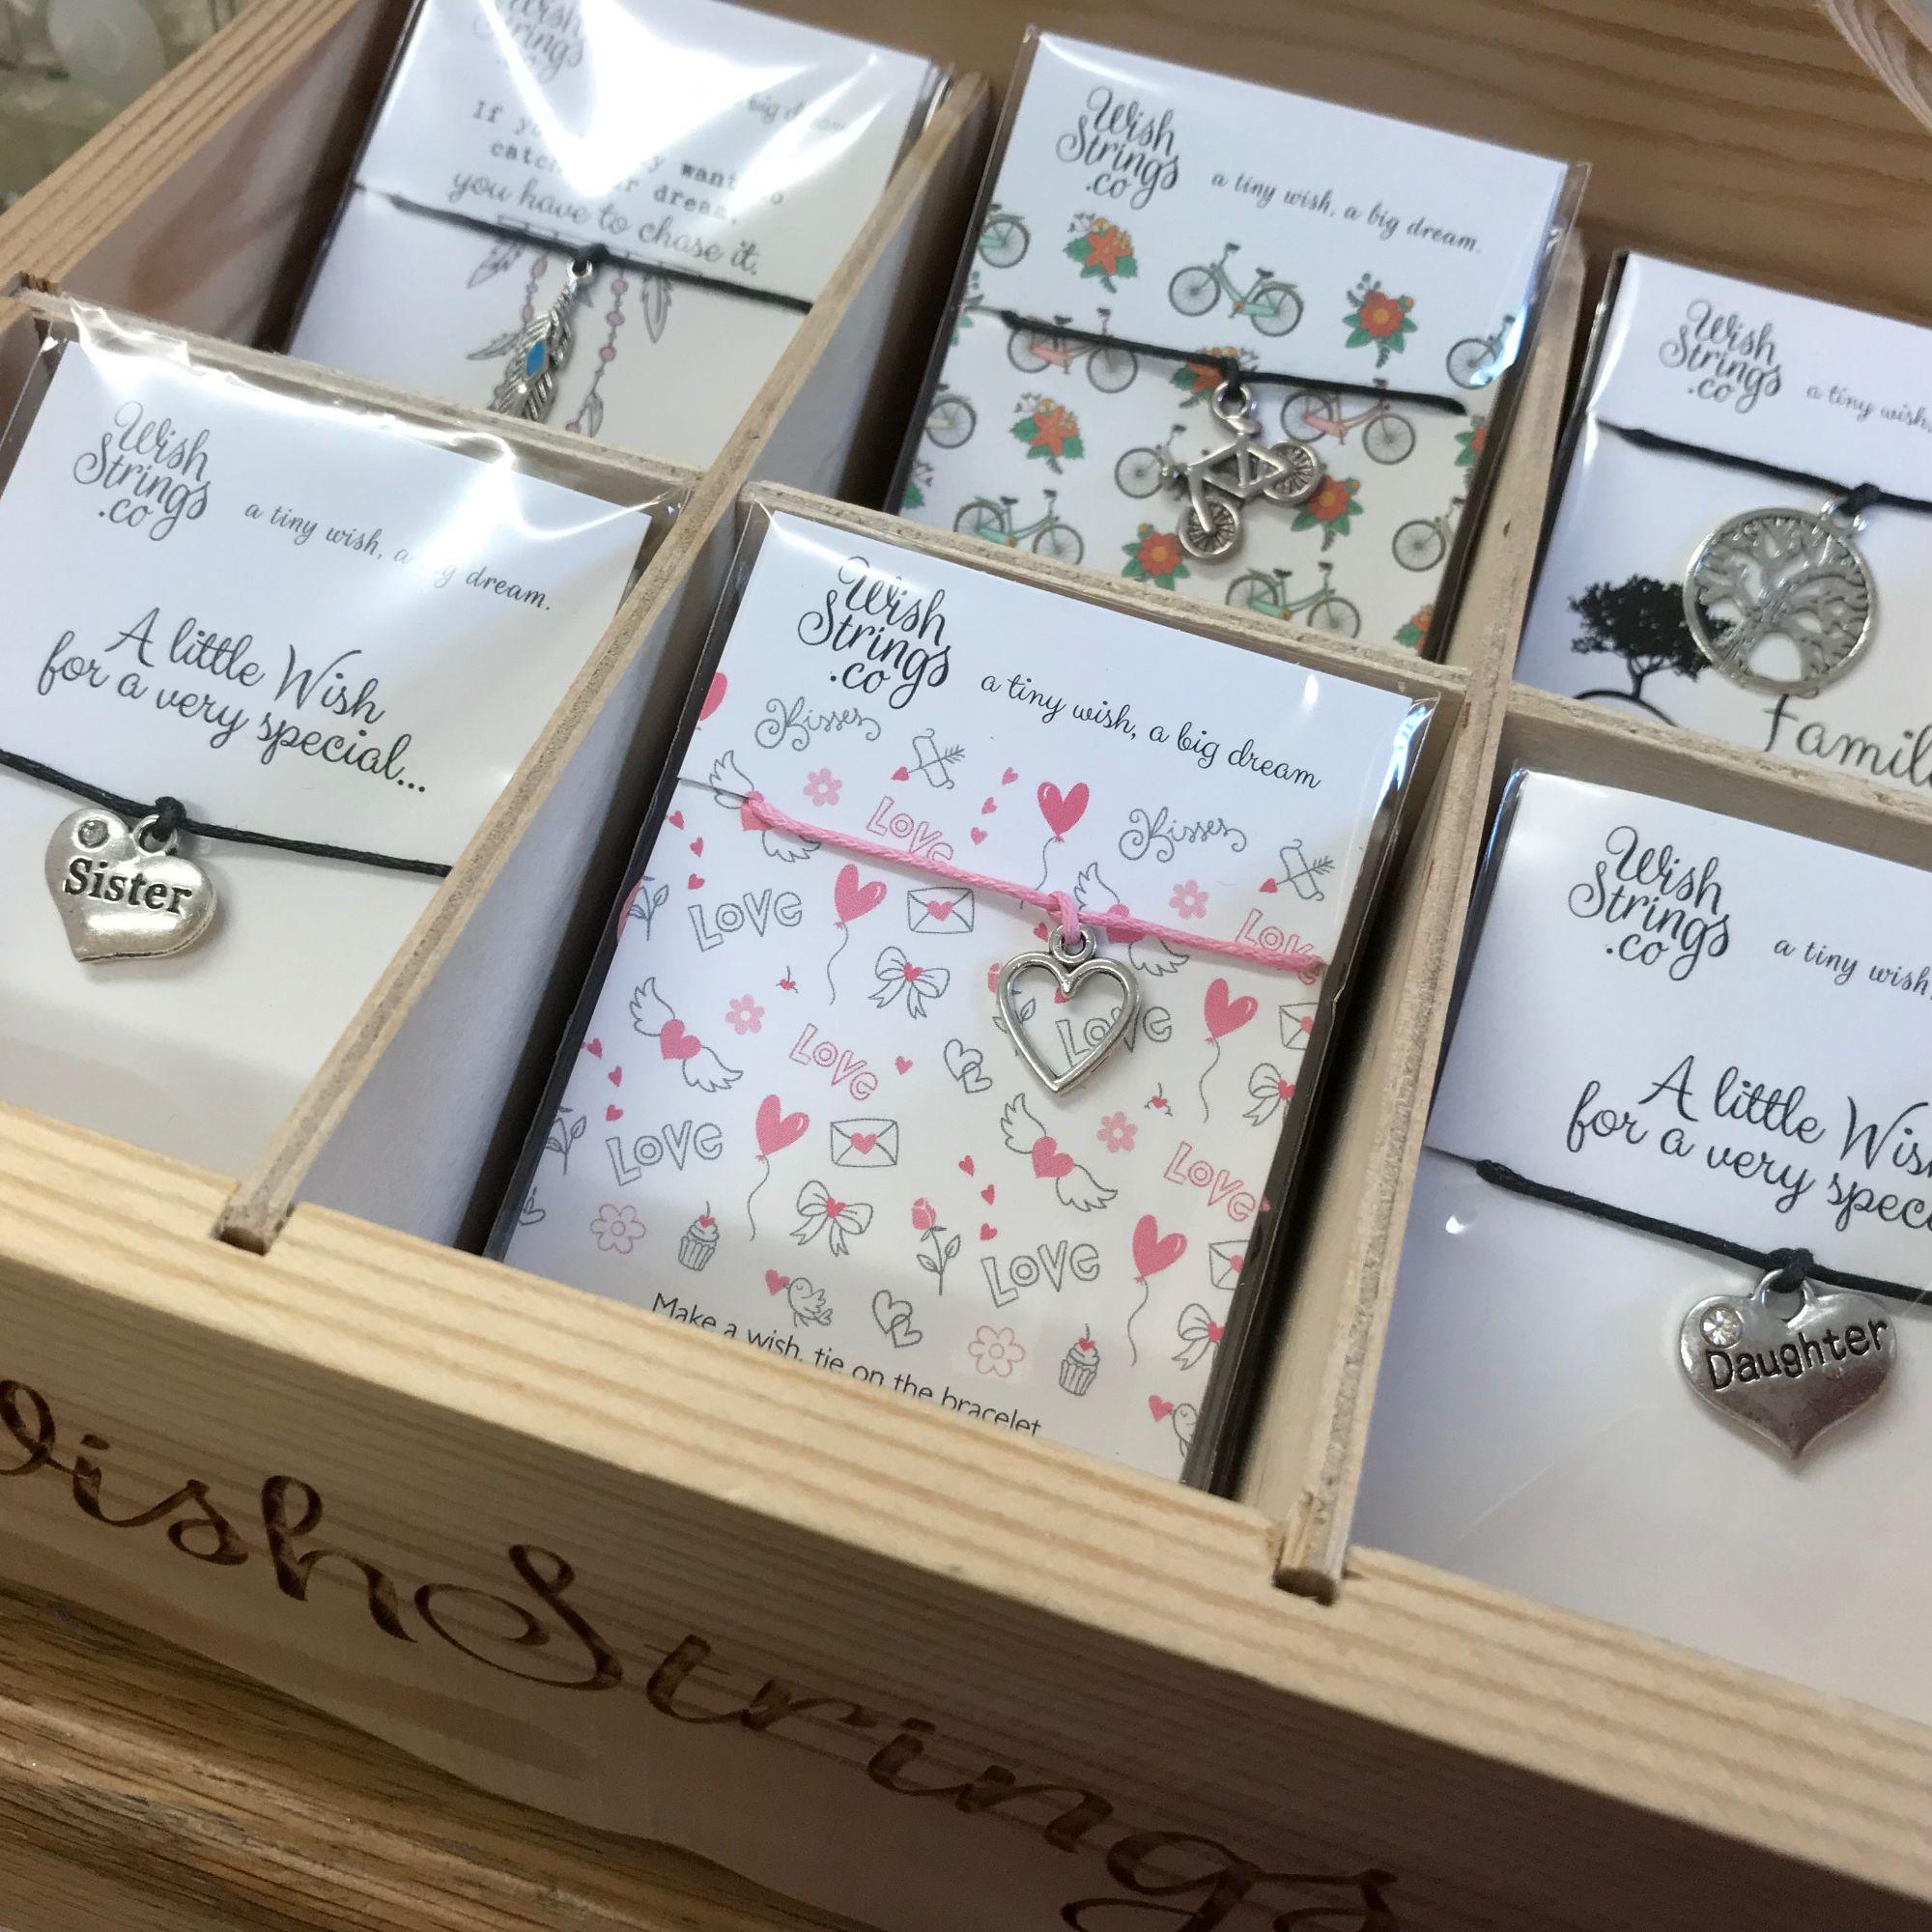 WIshstrings bracelets make great impulse buy 'extra' gifts